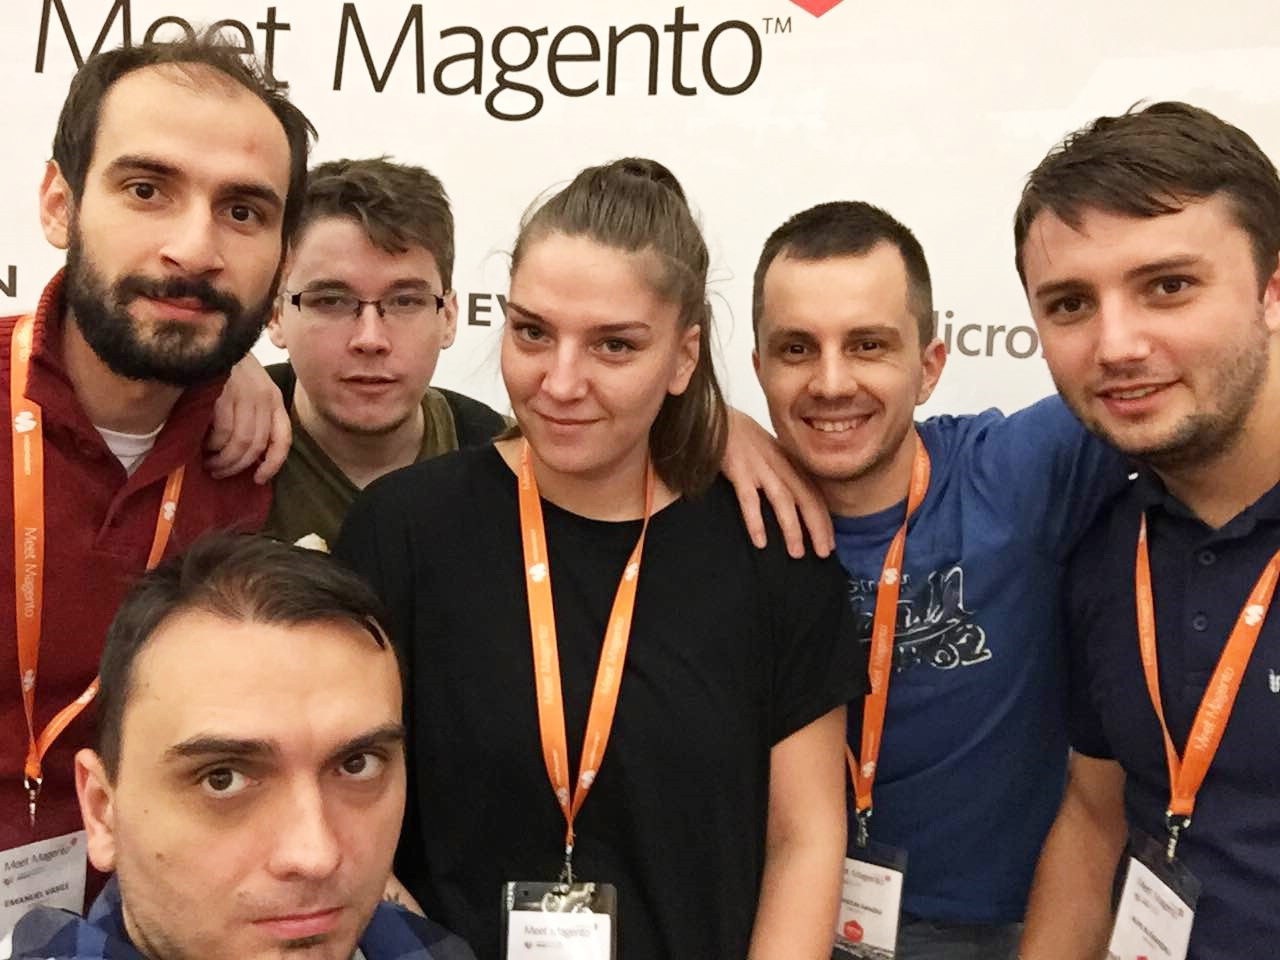 Innobyte at Meet Magento Romania